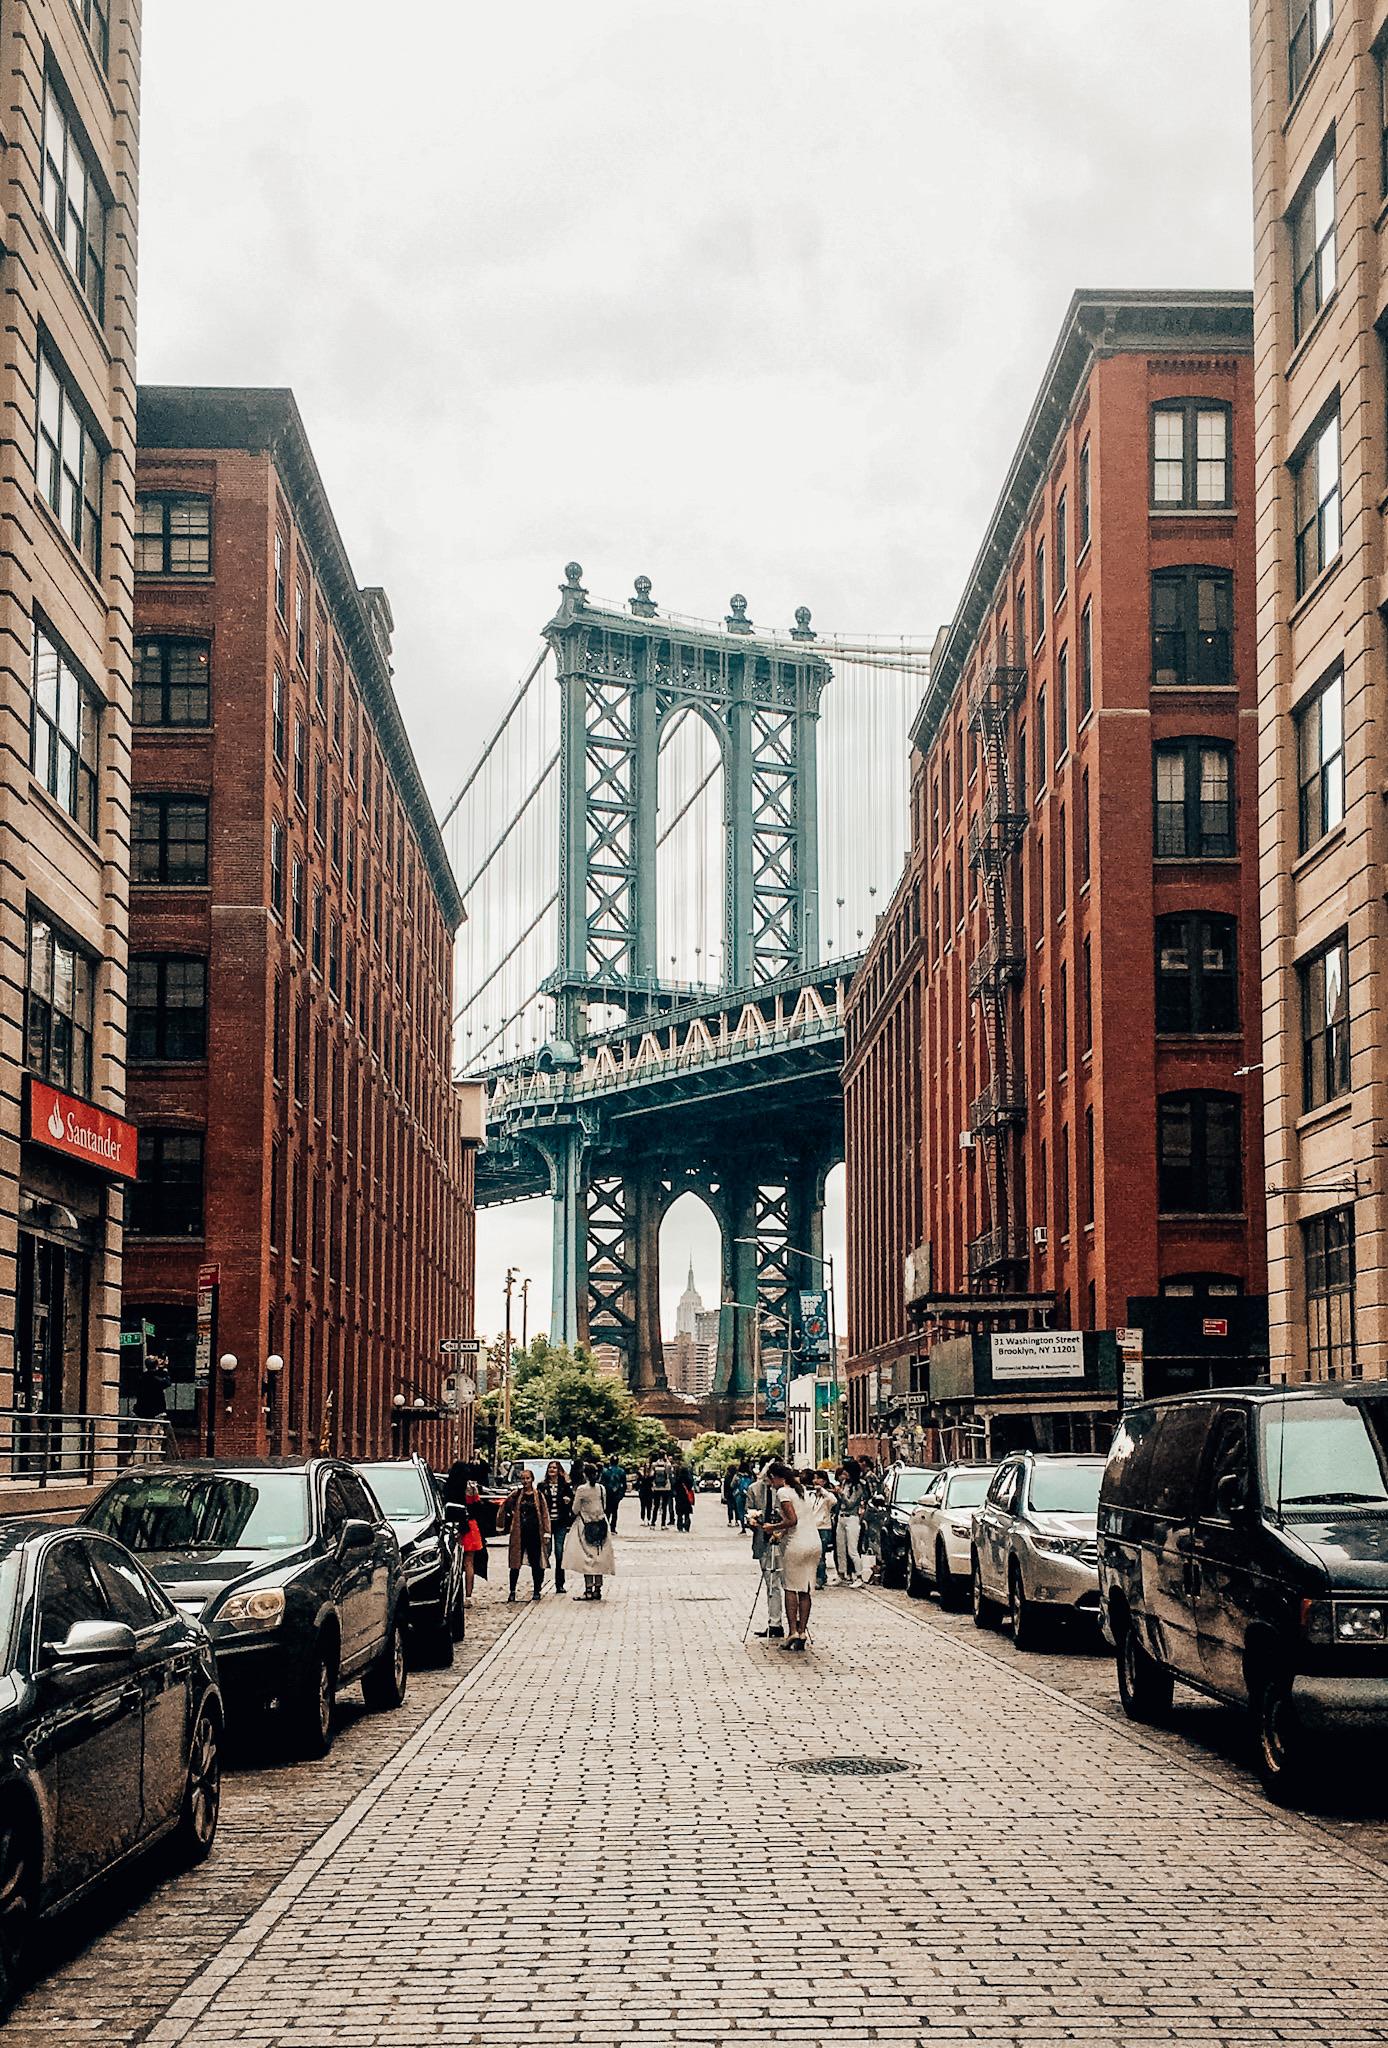 Washington Street in DUMBO with a view of the Manhattan Bridge